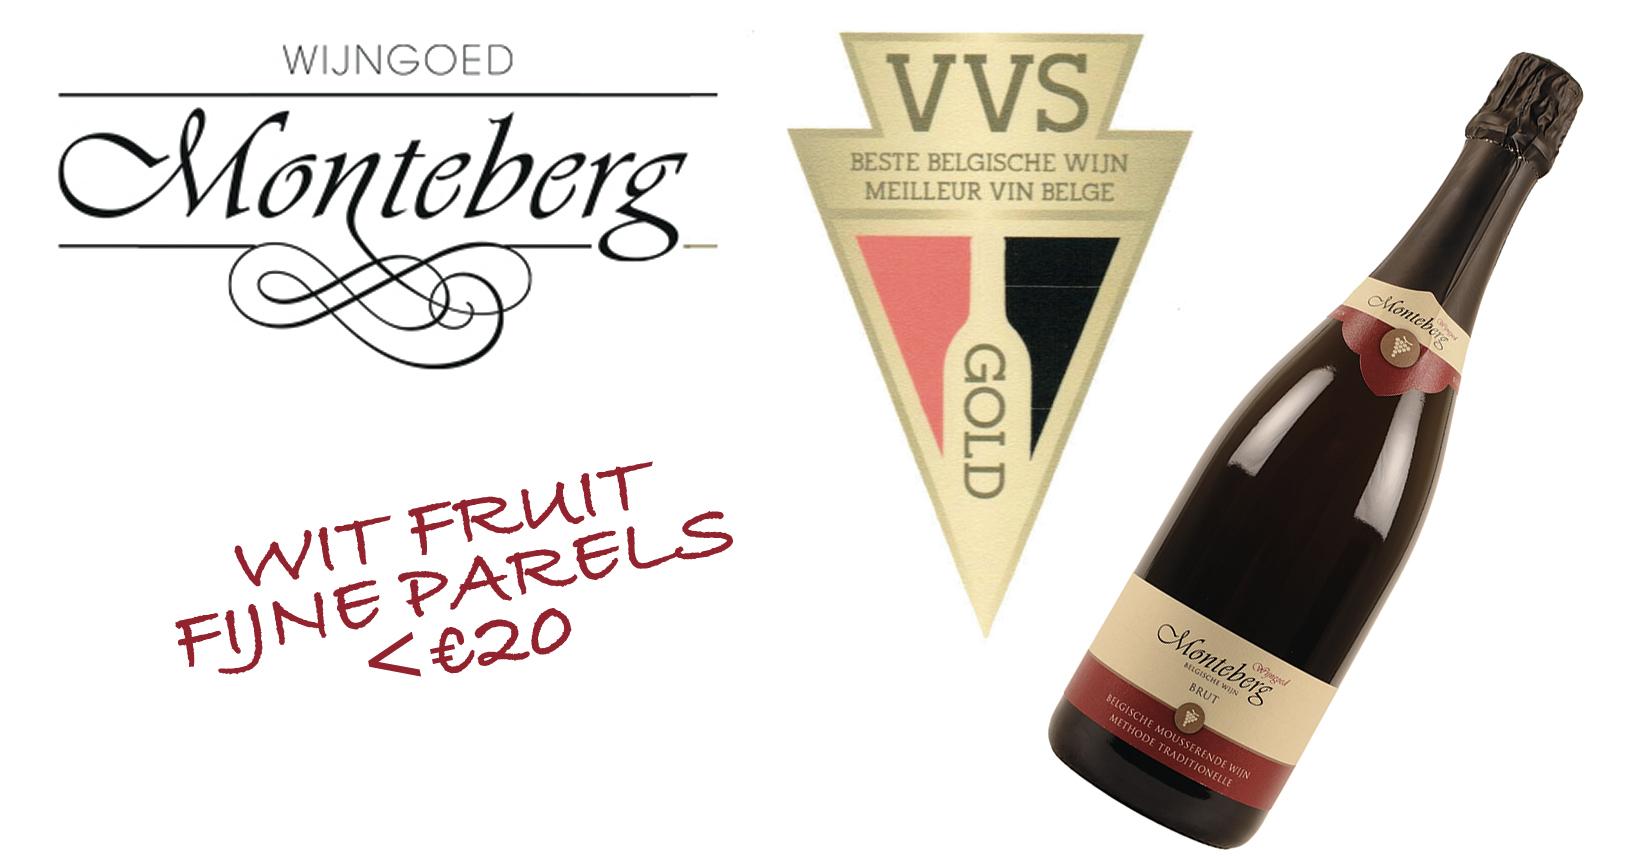 monteberg belgisch bubbels parels champagne promo